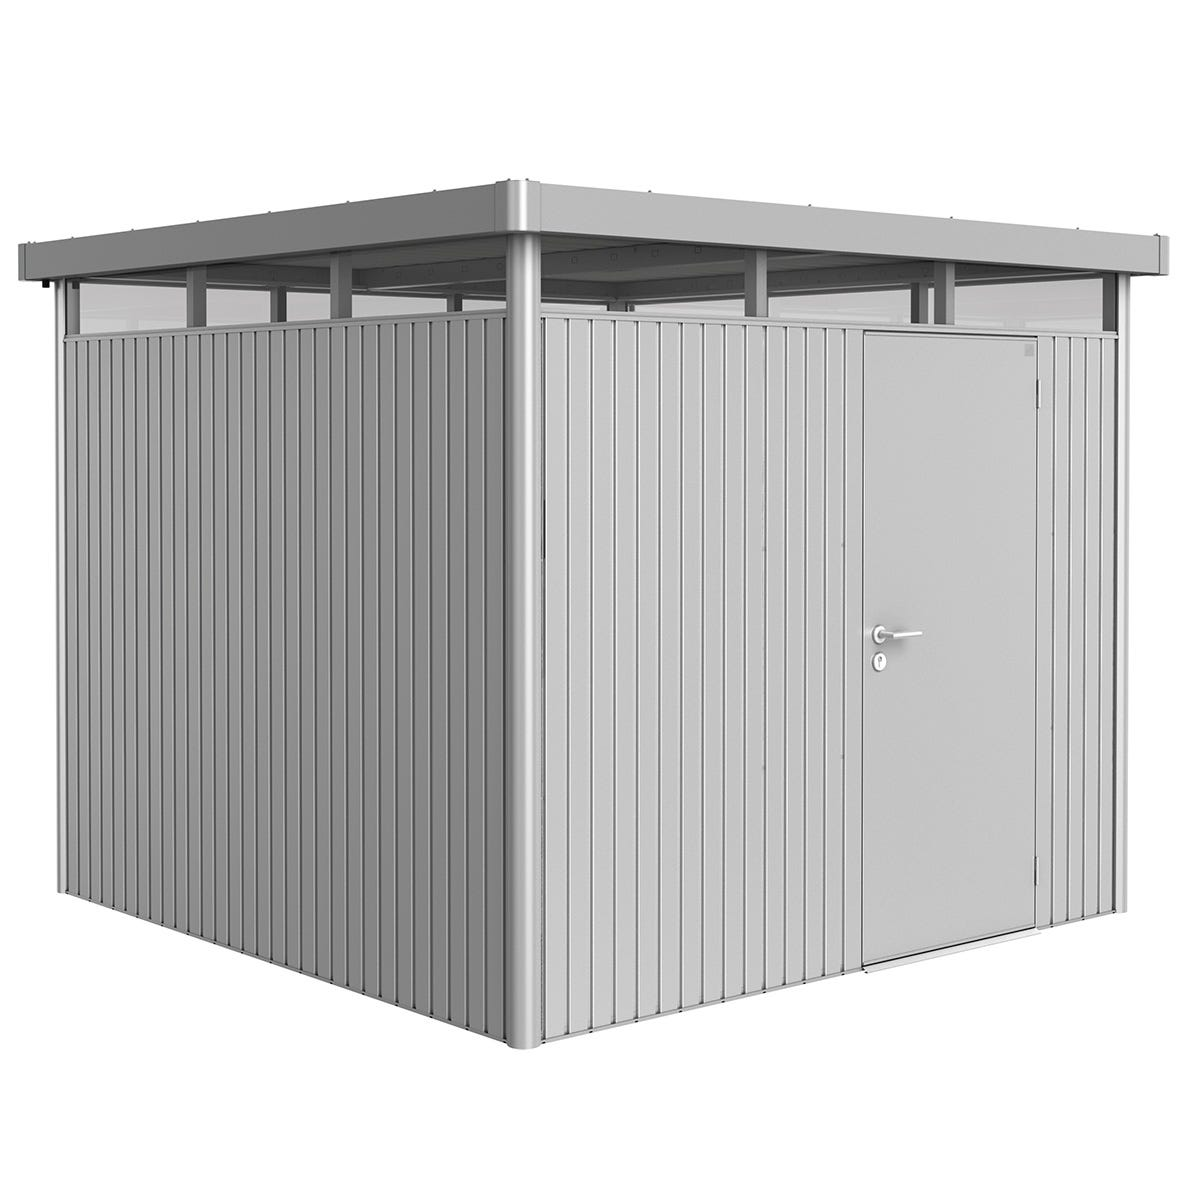 Biohort Highline Metal Shed H4 Standard door 9 x 9 - Metallic Silver